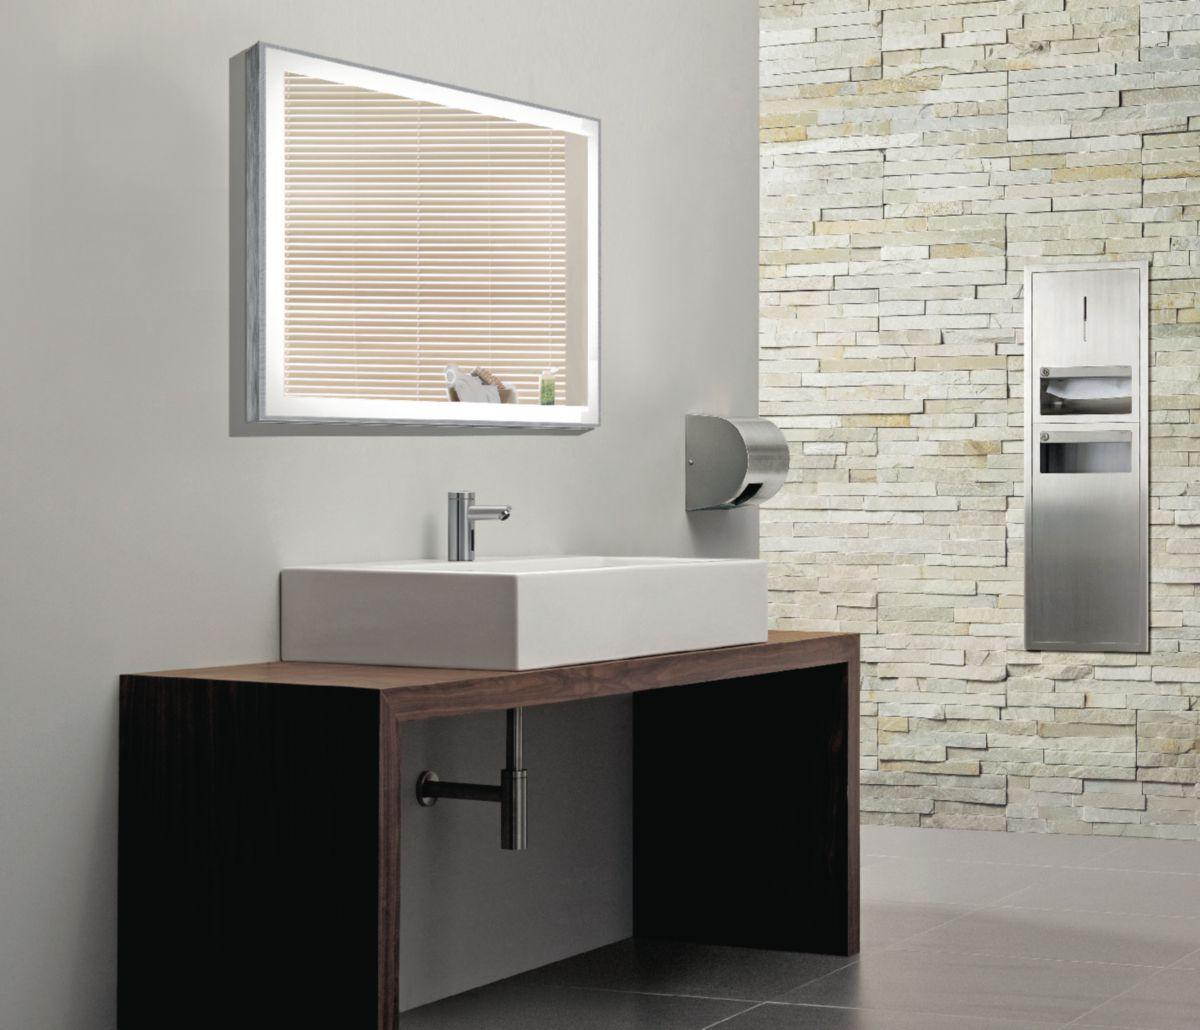 miroir r tro clair naos l 70 cm envie de salle de bain. Black Bedroom Furniture Sets. Home Design Ideas